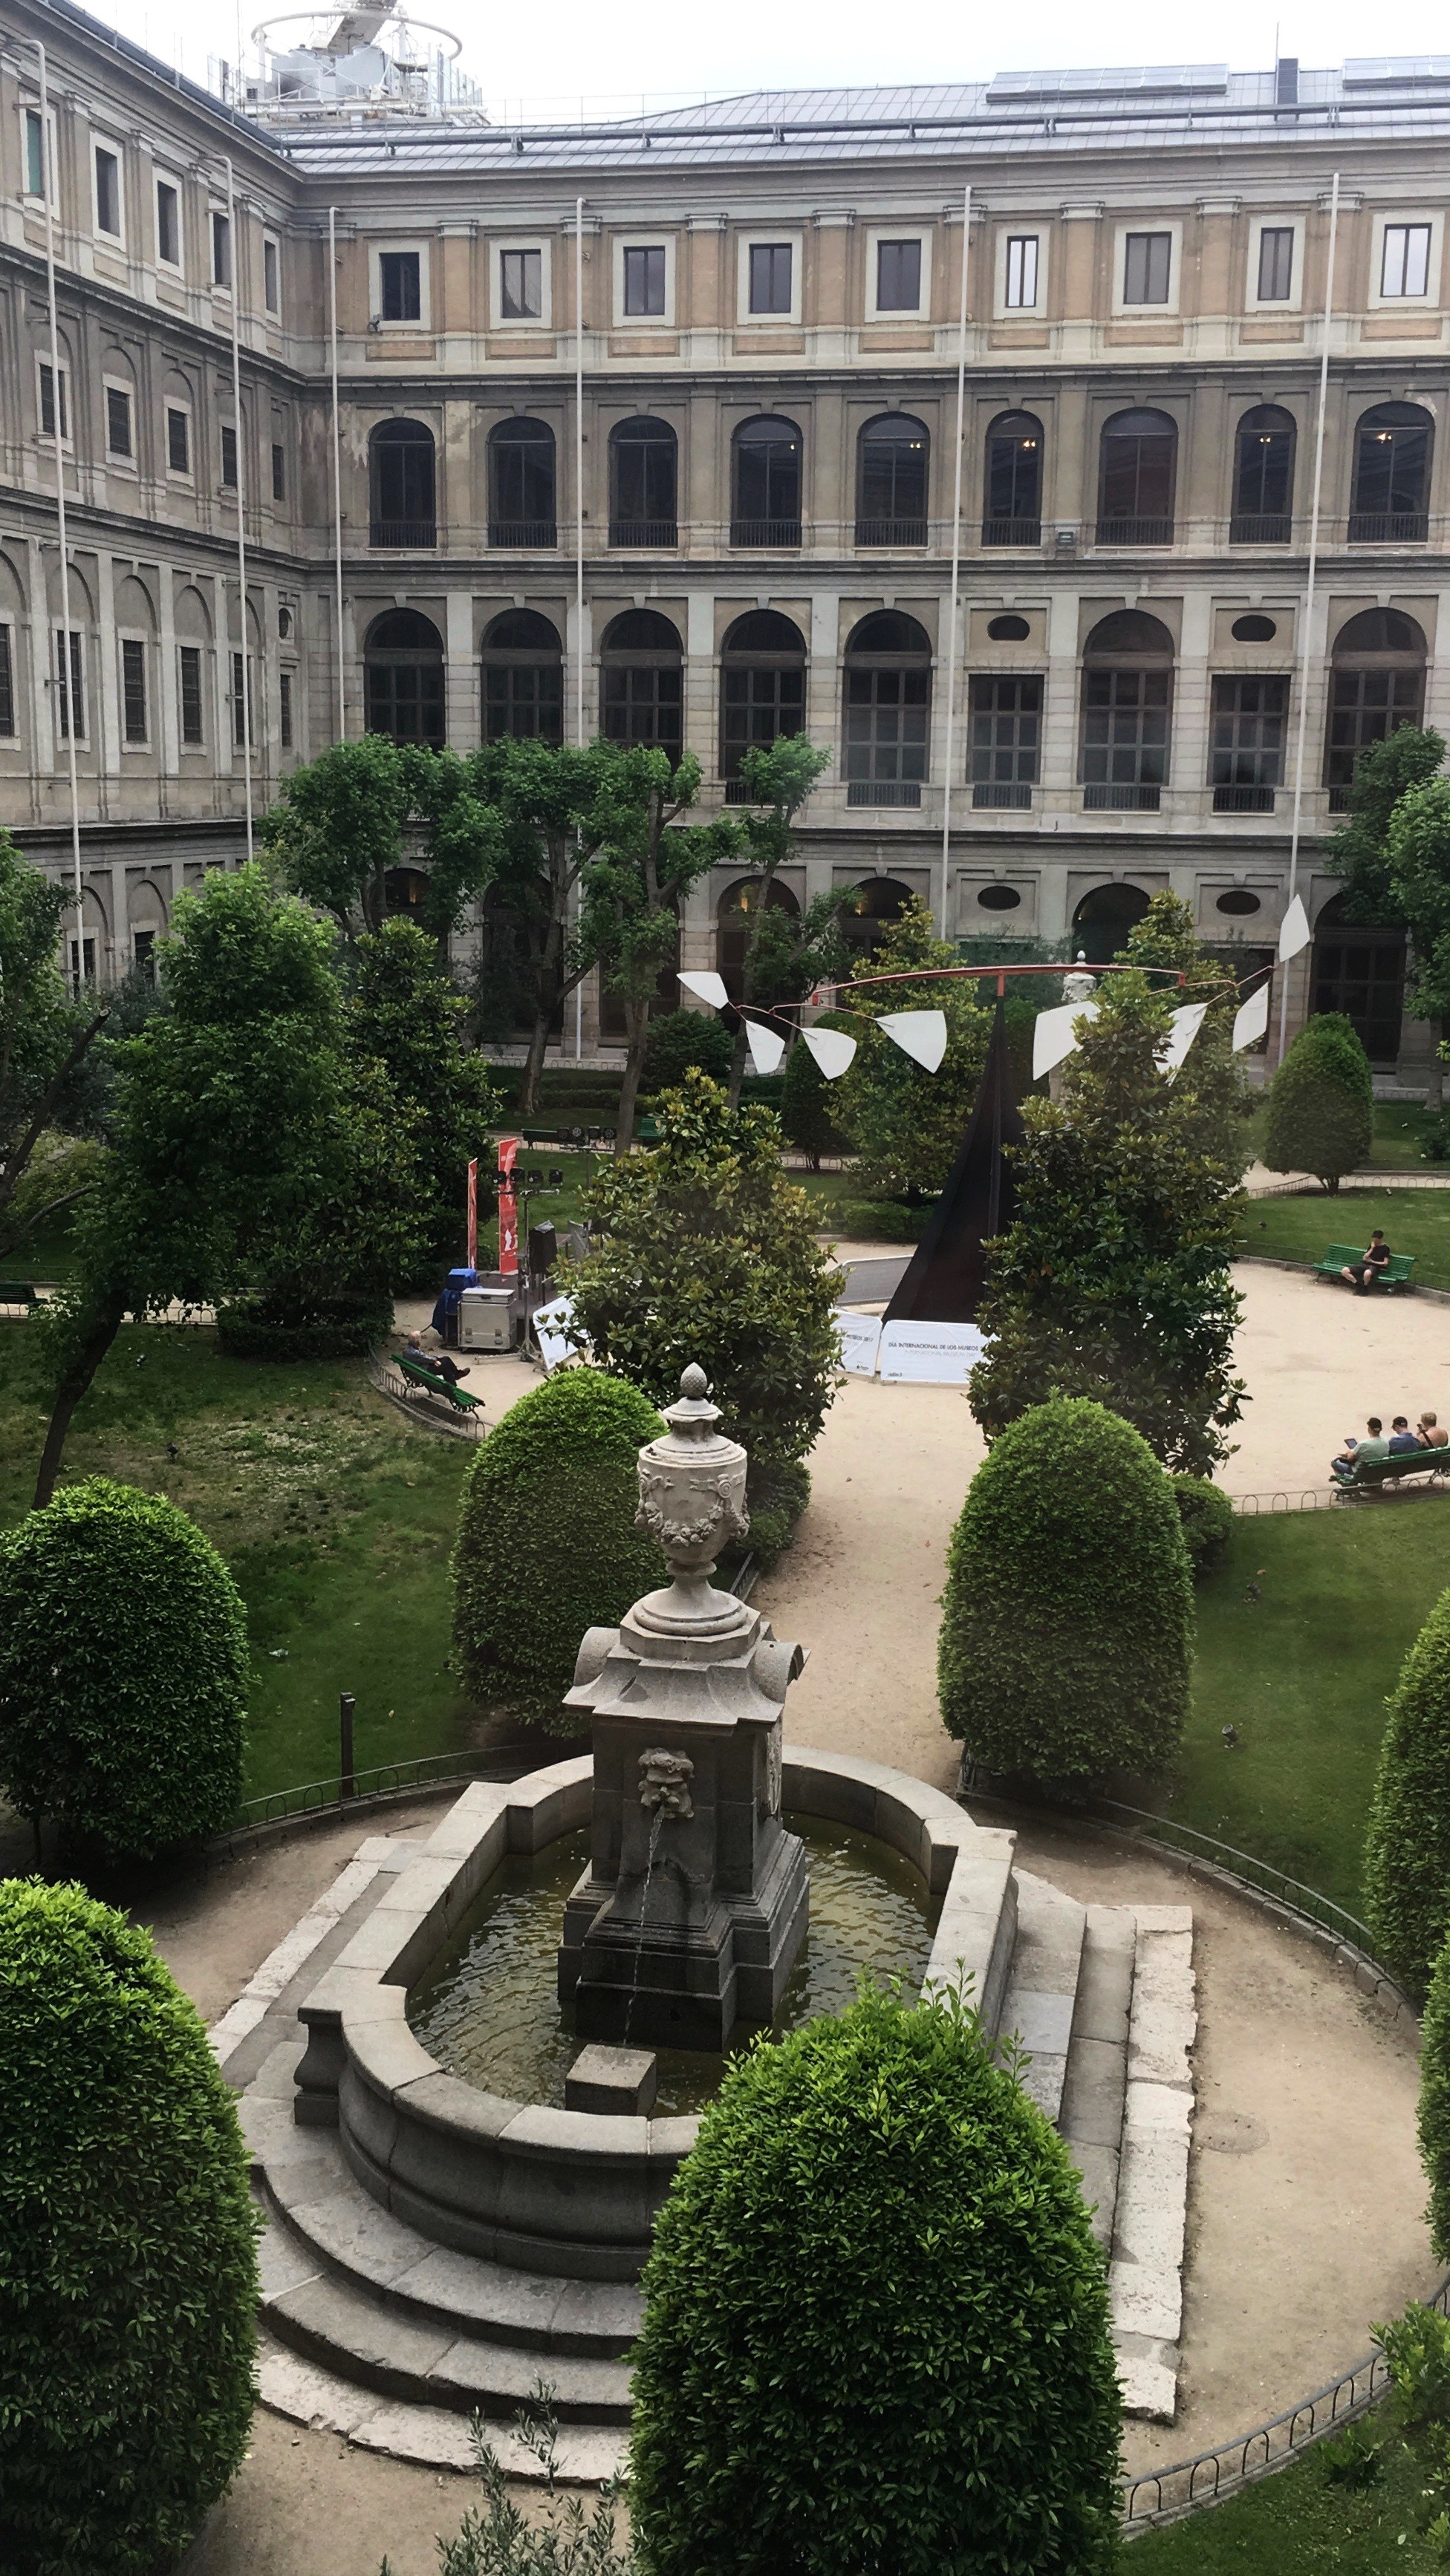 Reina Sofía Museum, Madrid: All year